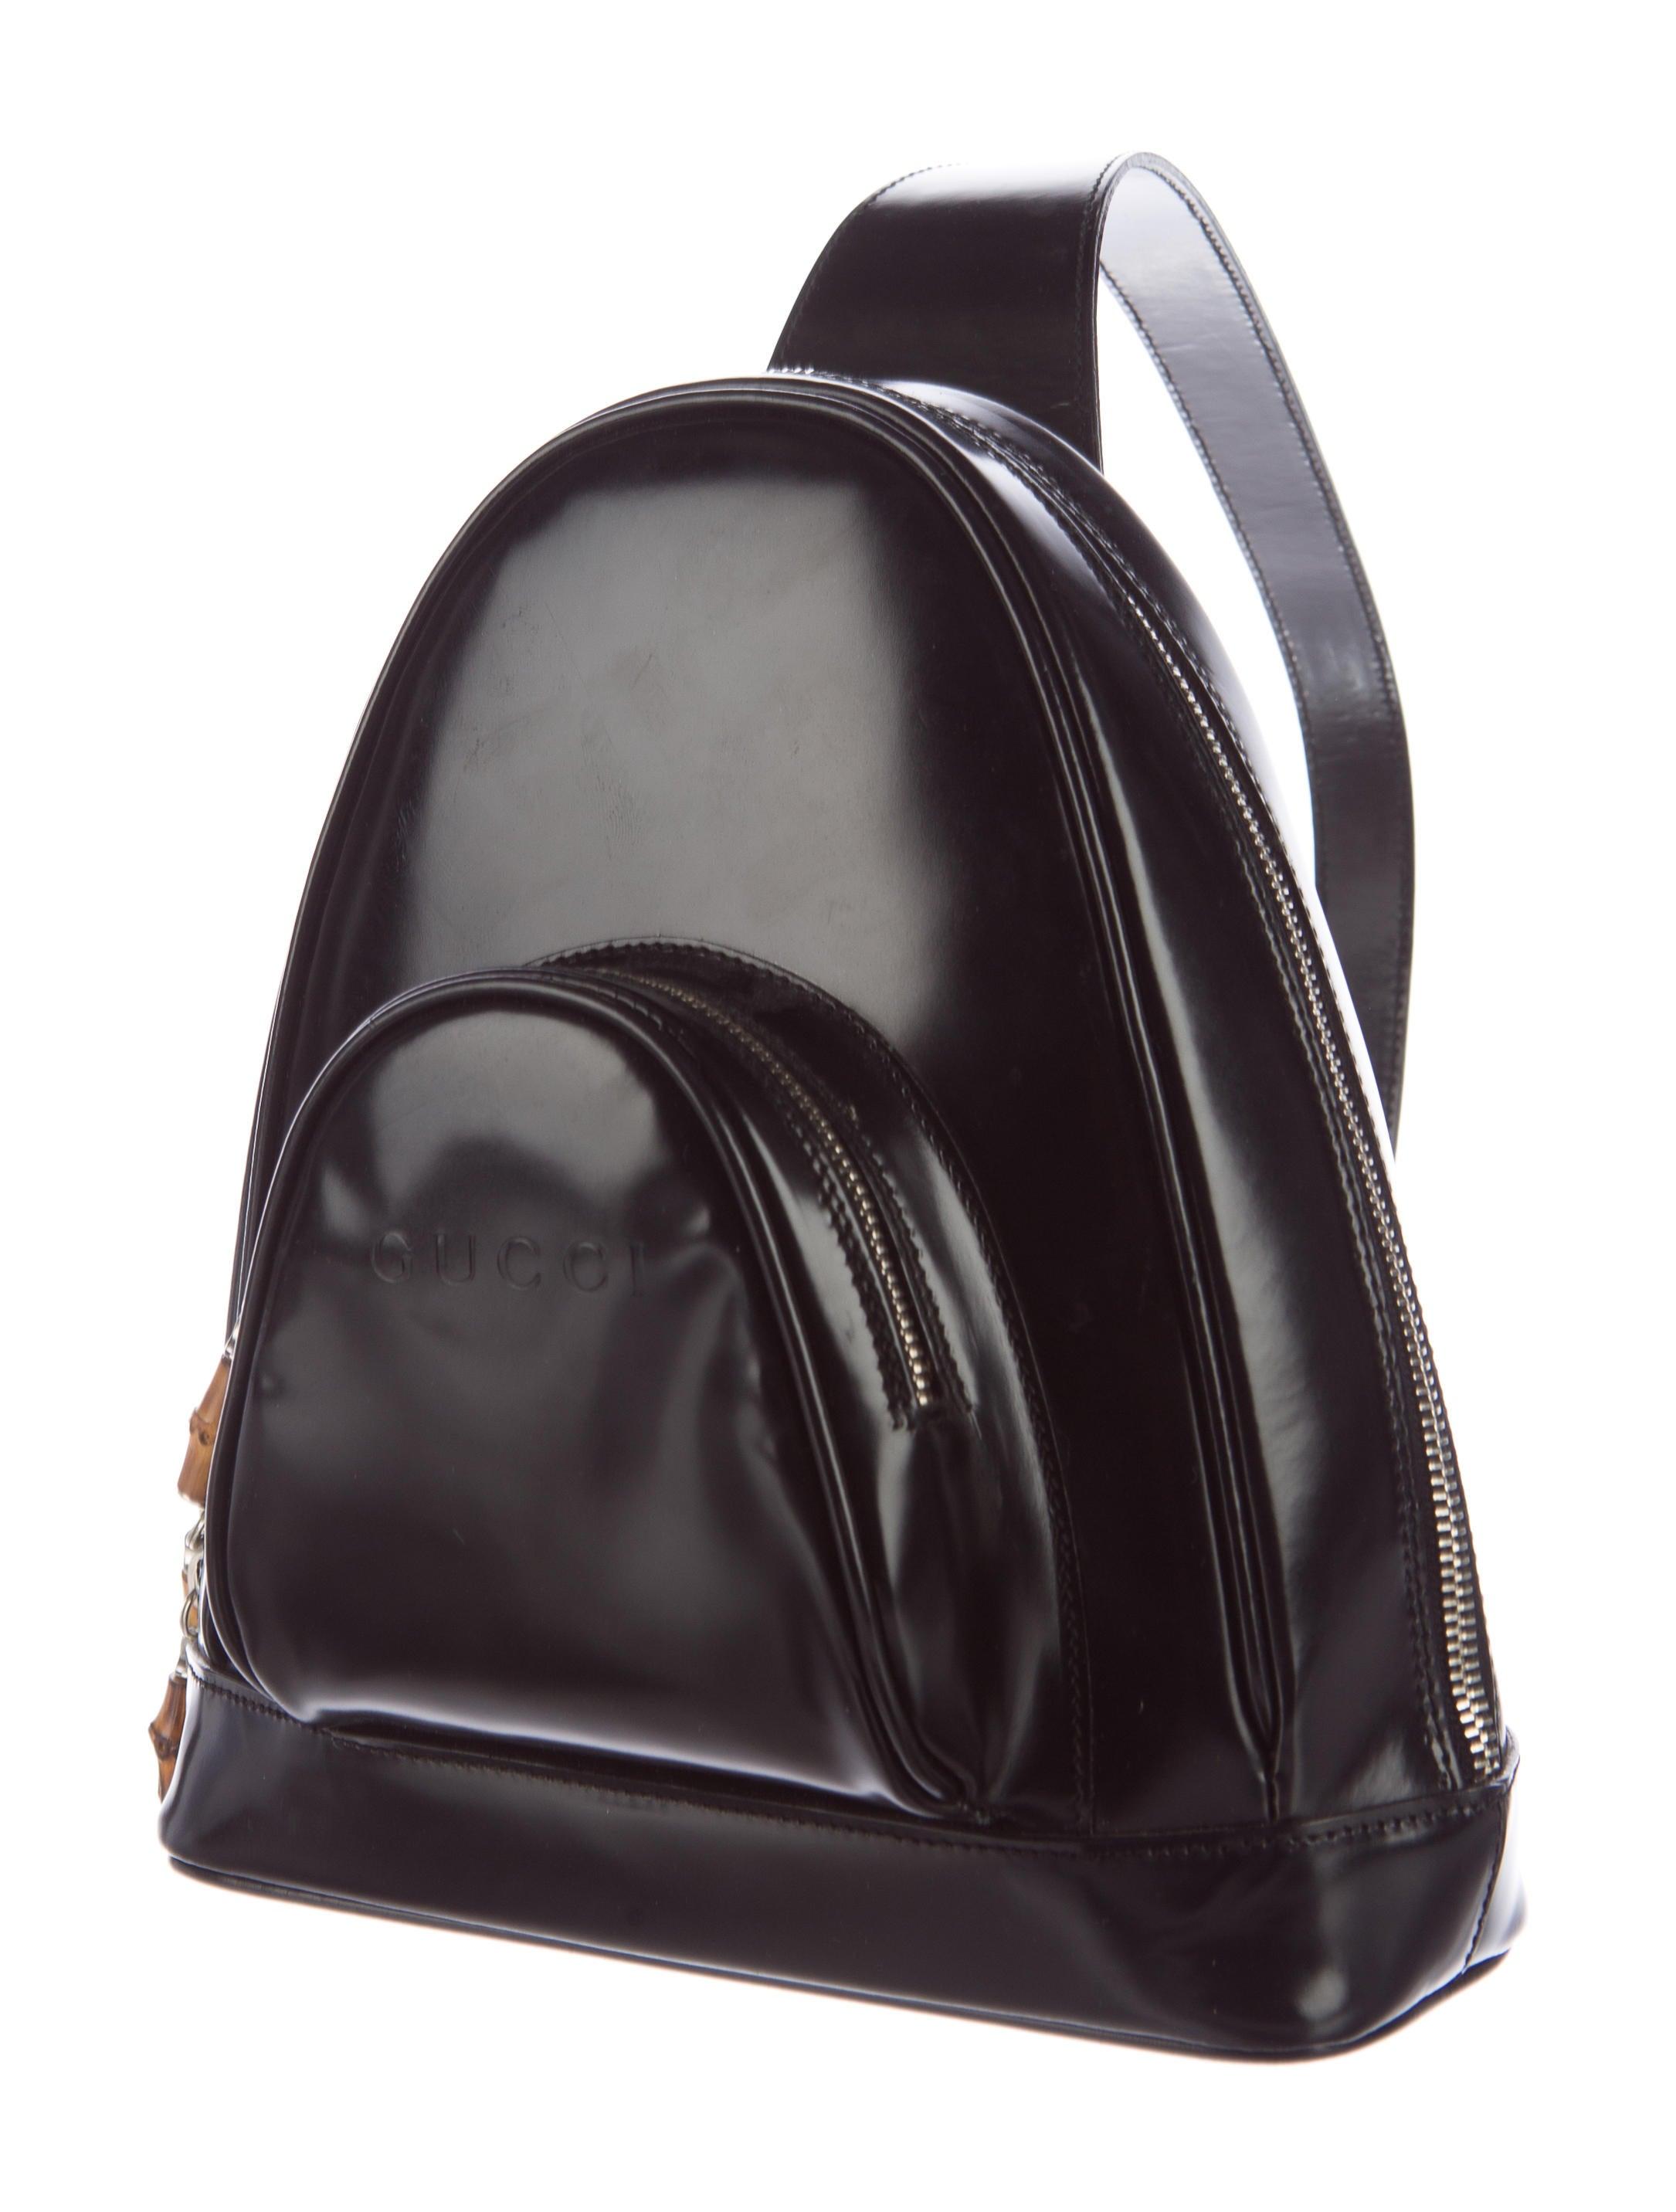 Cool Gucci Bamboo Sling Bag - Handbags - GUC136114 | The RealReal